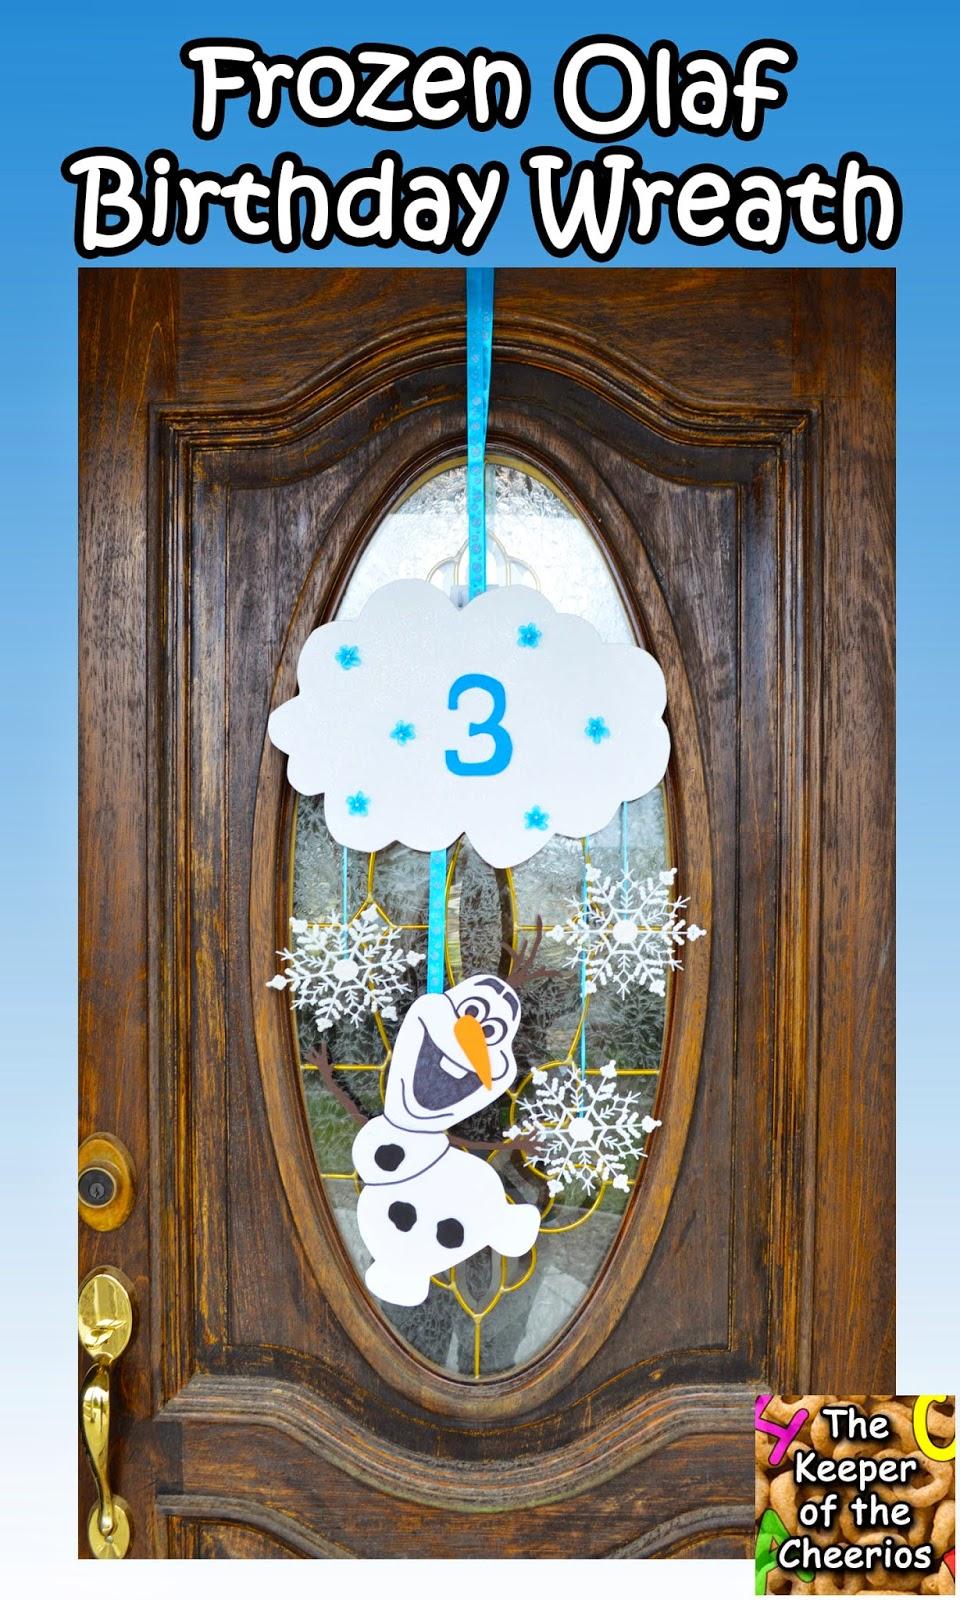 Frozen Olaf Birthday Door Wreath The Keeper Of The Cheerios